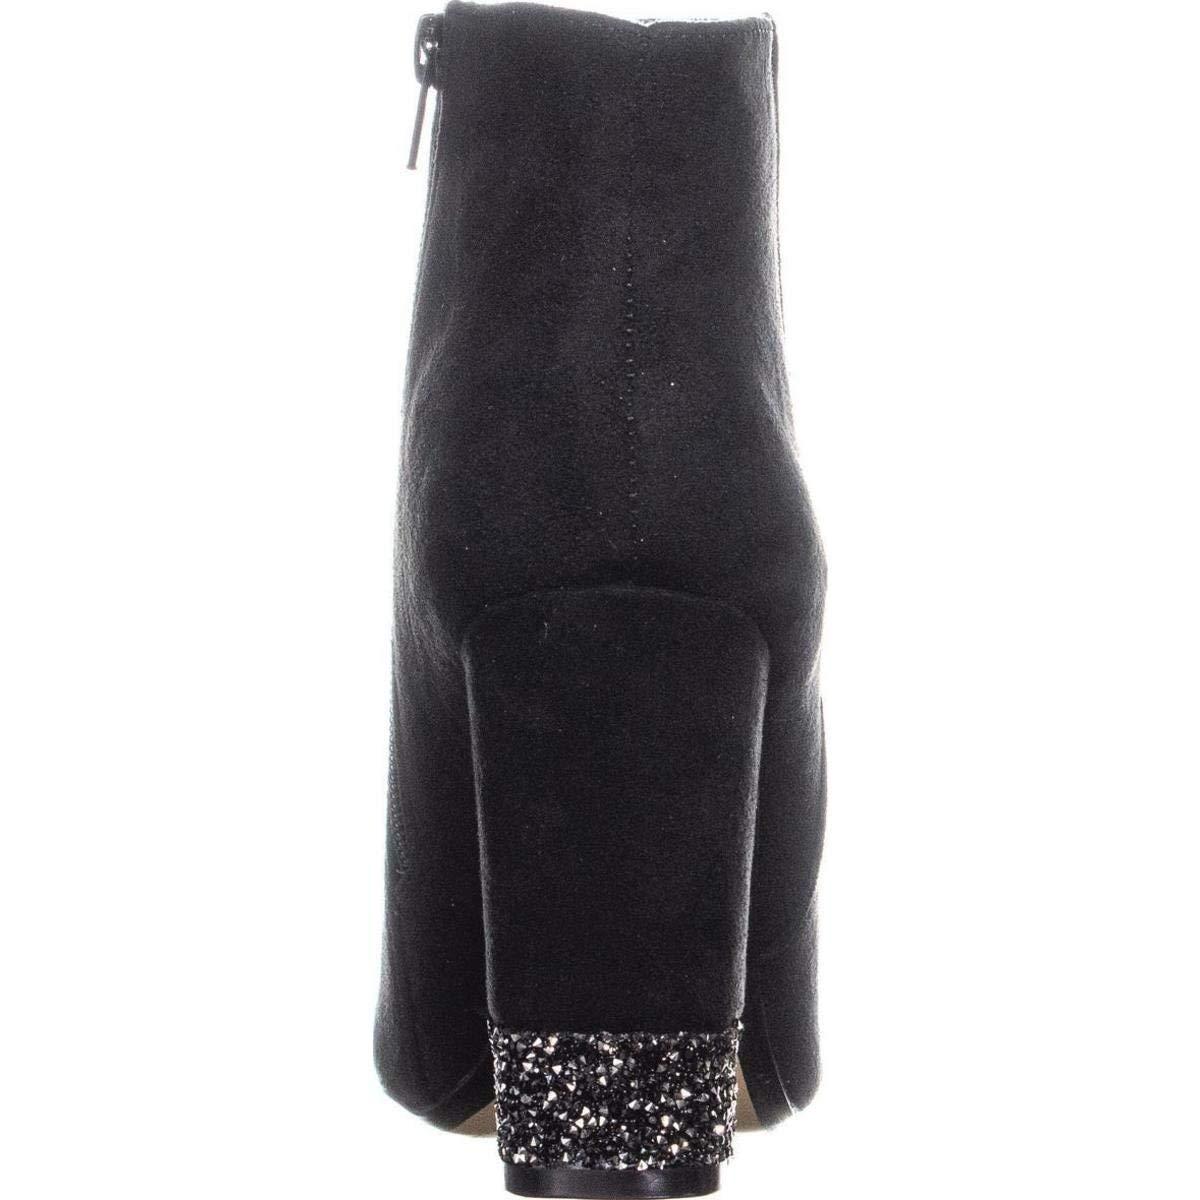 Size 9.0 Black XOXO Womens Yardley Fabric Closed Toe Ankle Fashion Boots